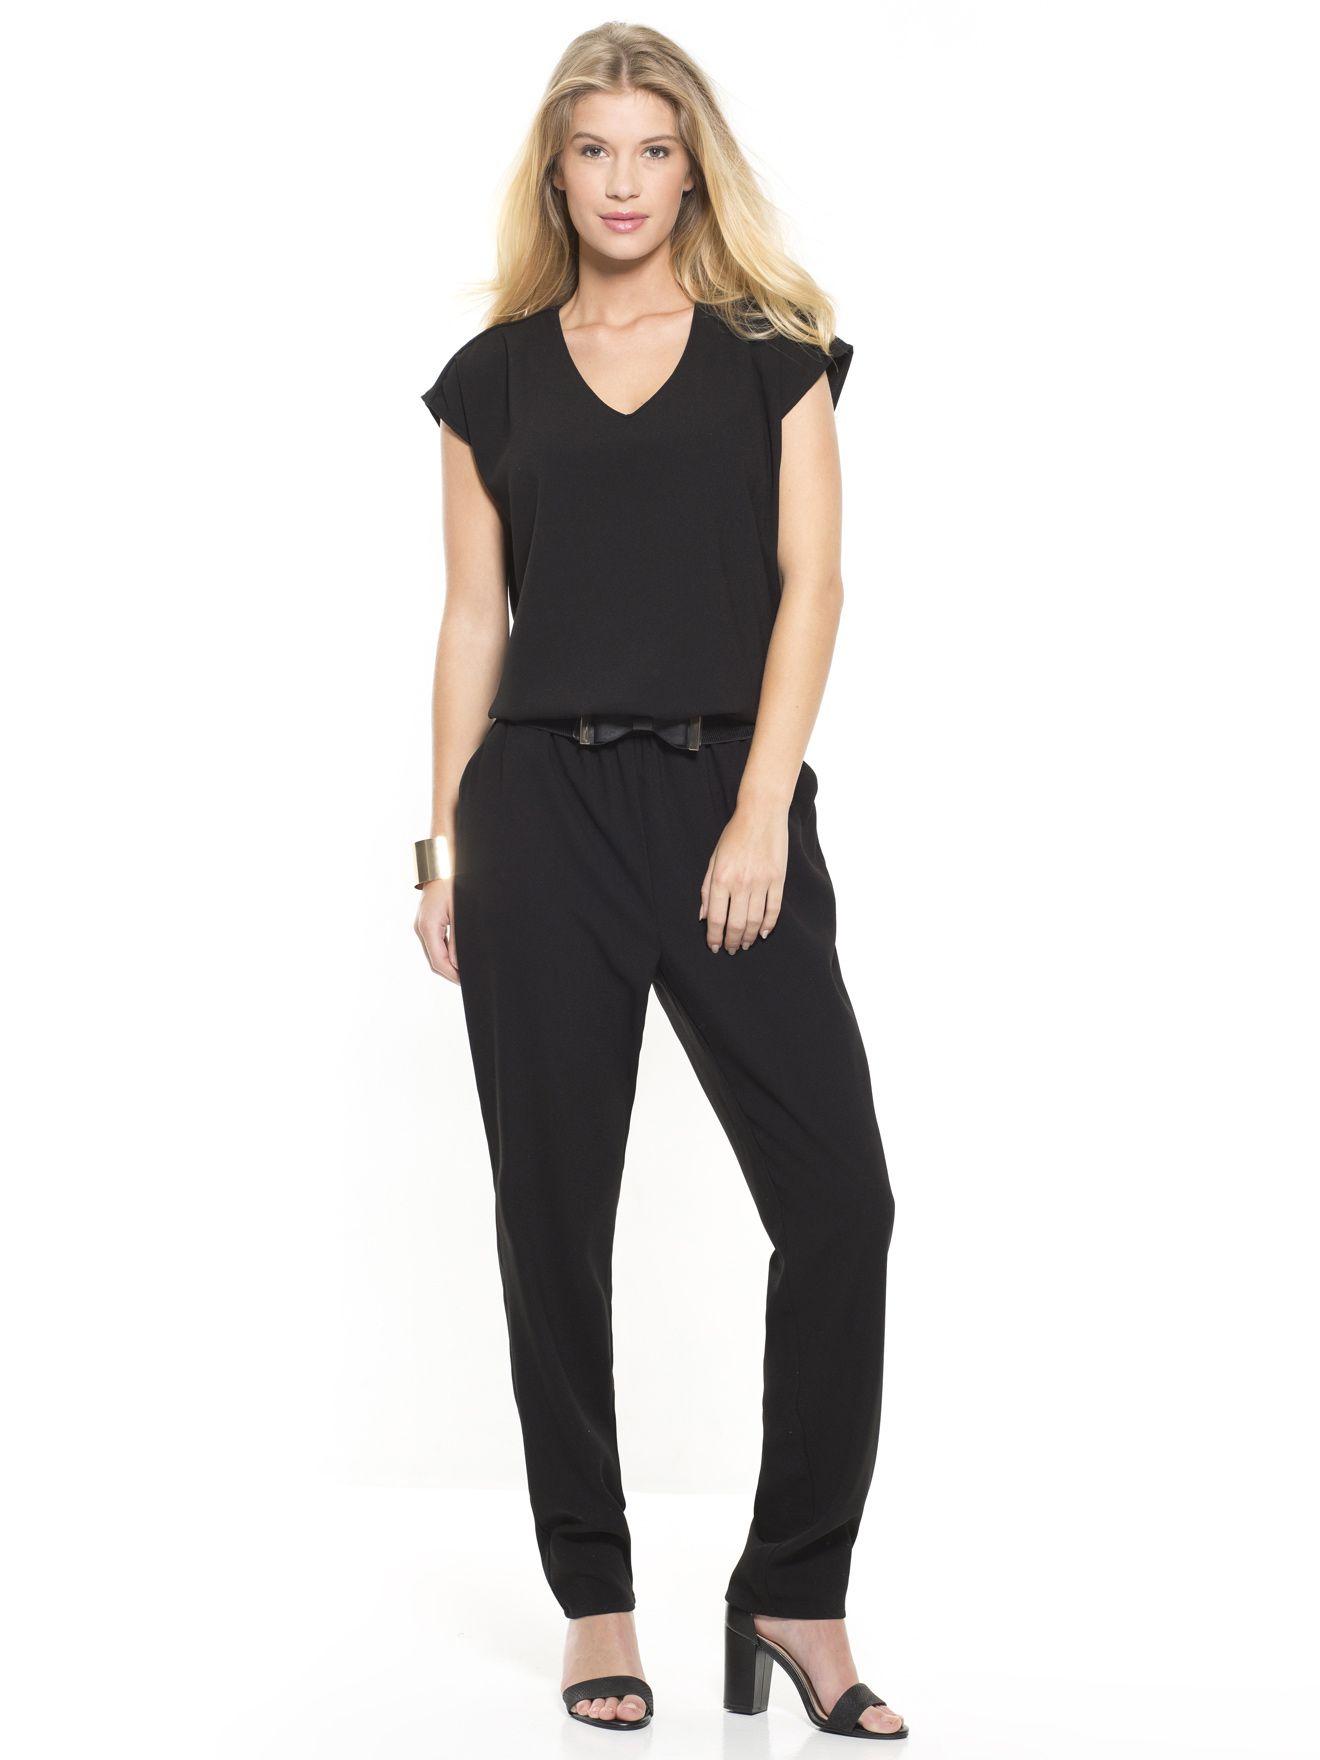 BALSAMIK - Combinaison femme, combinaison pantalon femme